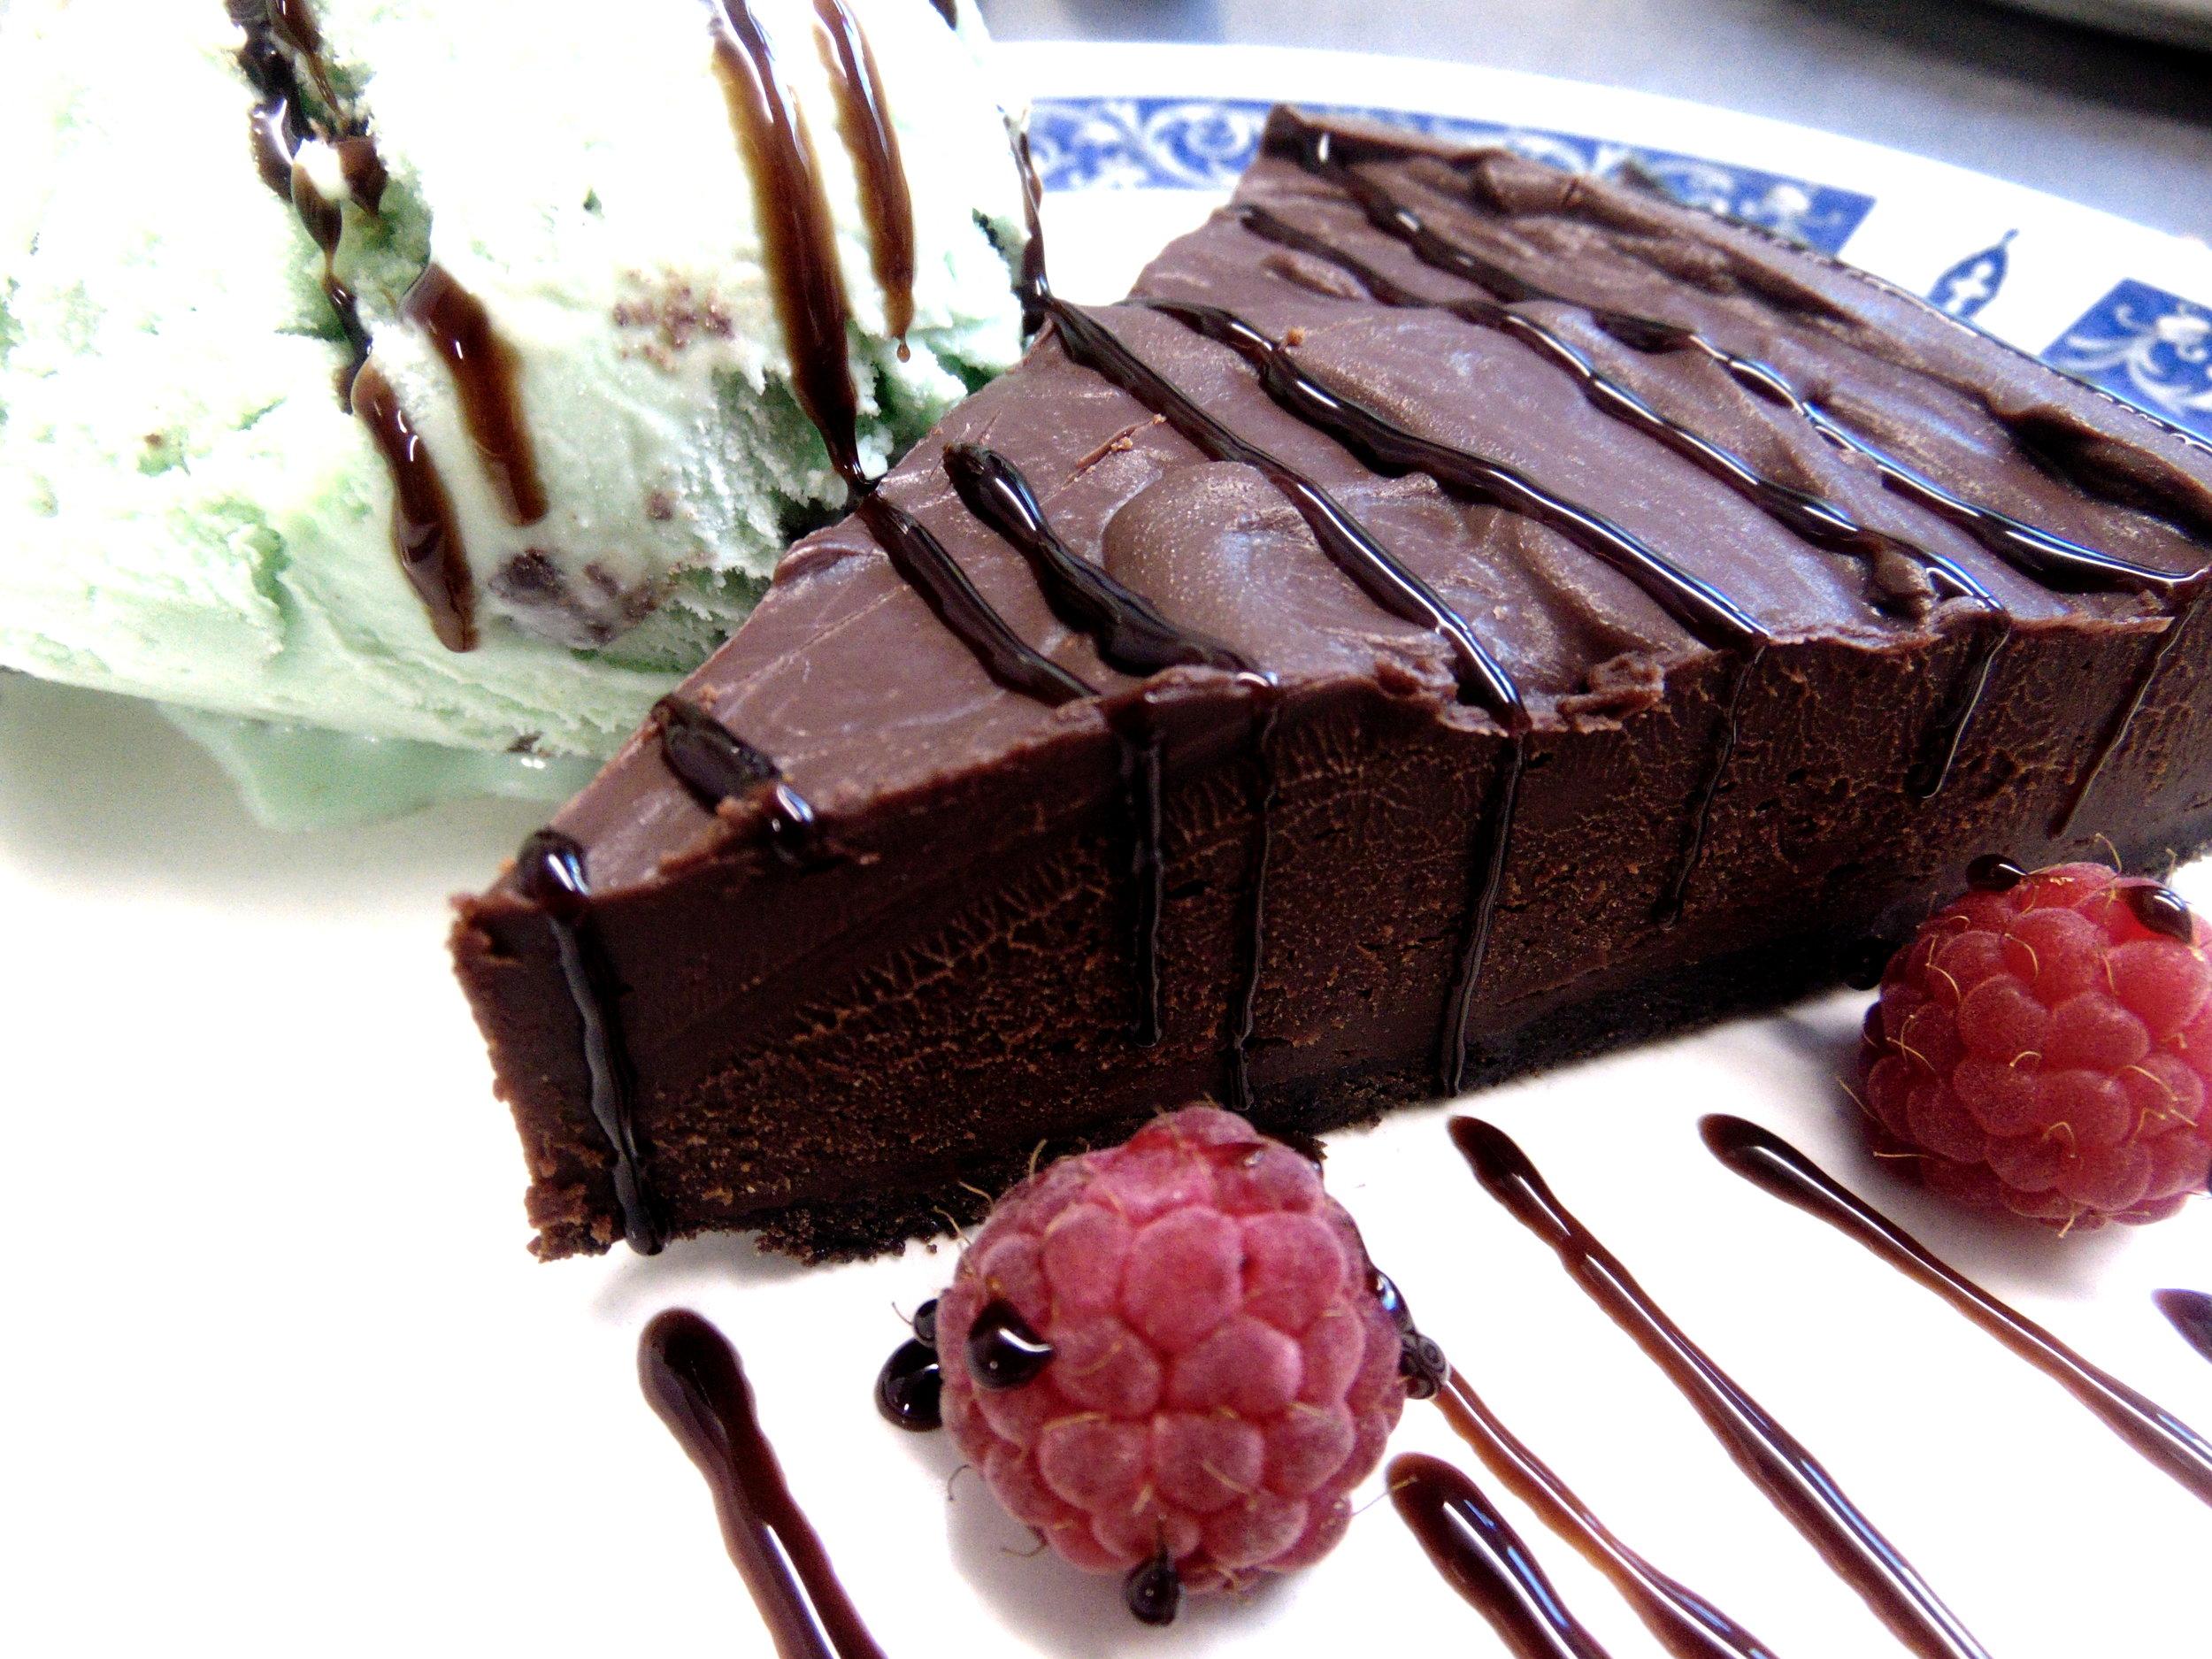 White-Hart-Inn-Bridestowe-Devon-Eat-with-Us-Restaurant-Menu-Chocolate-Torte-Homemade-Mint-Choc-Chip-Ice-Cream-Raspberry-Sauce.JPG